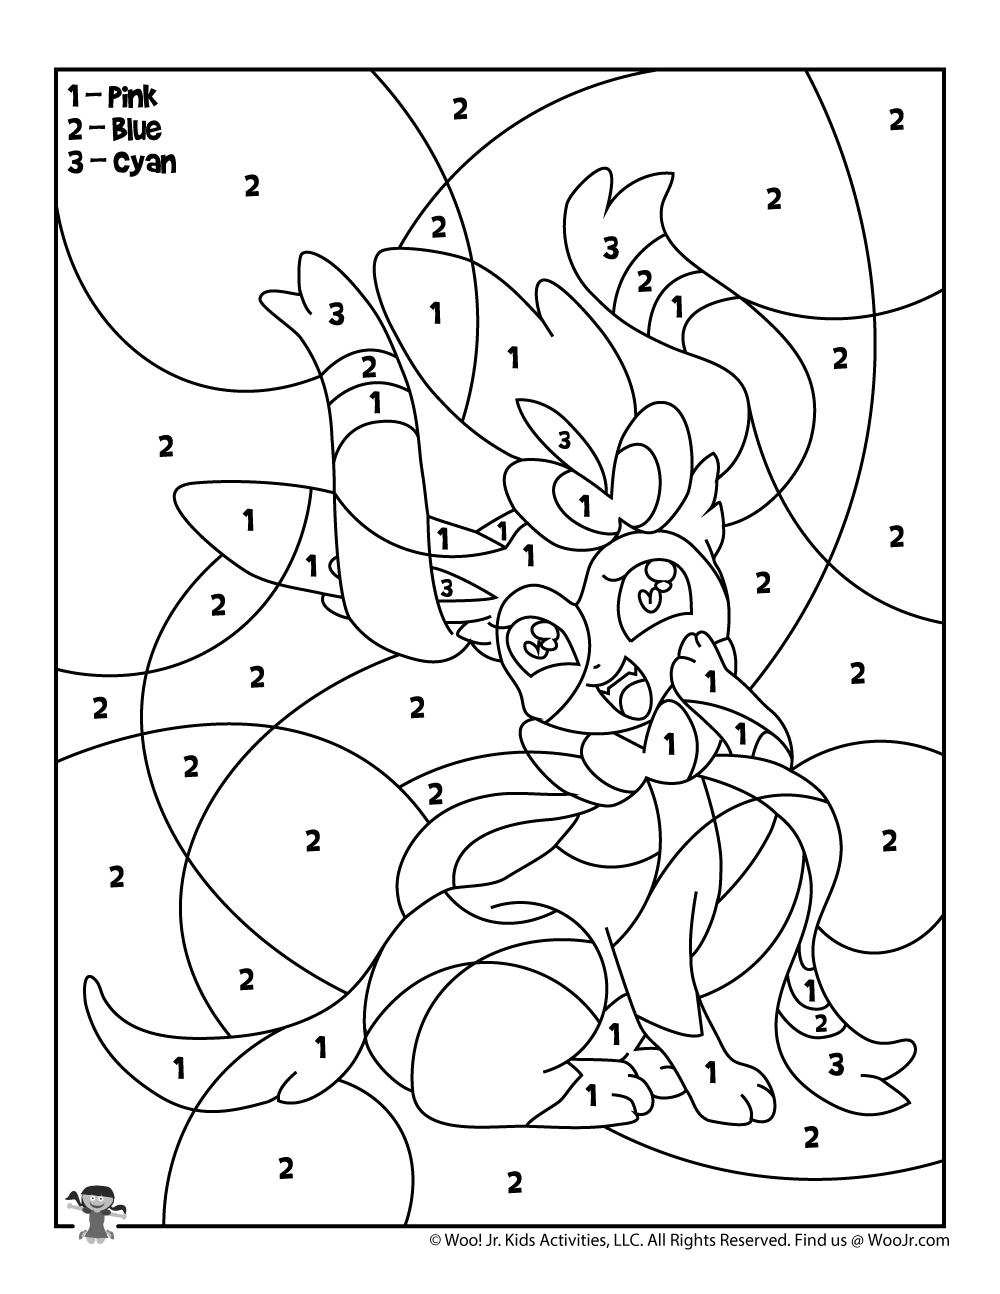 Sylveon Pokemon Color By Number Printable Woo Jr Kids